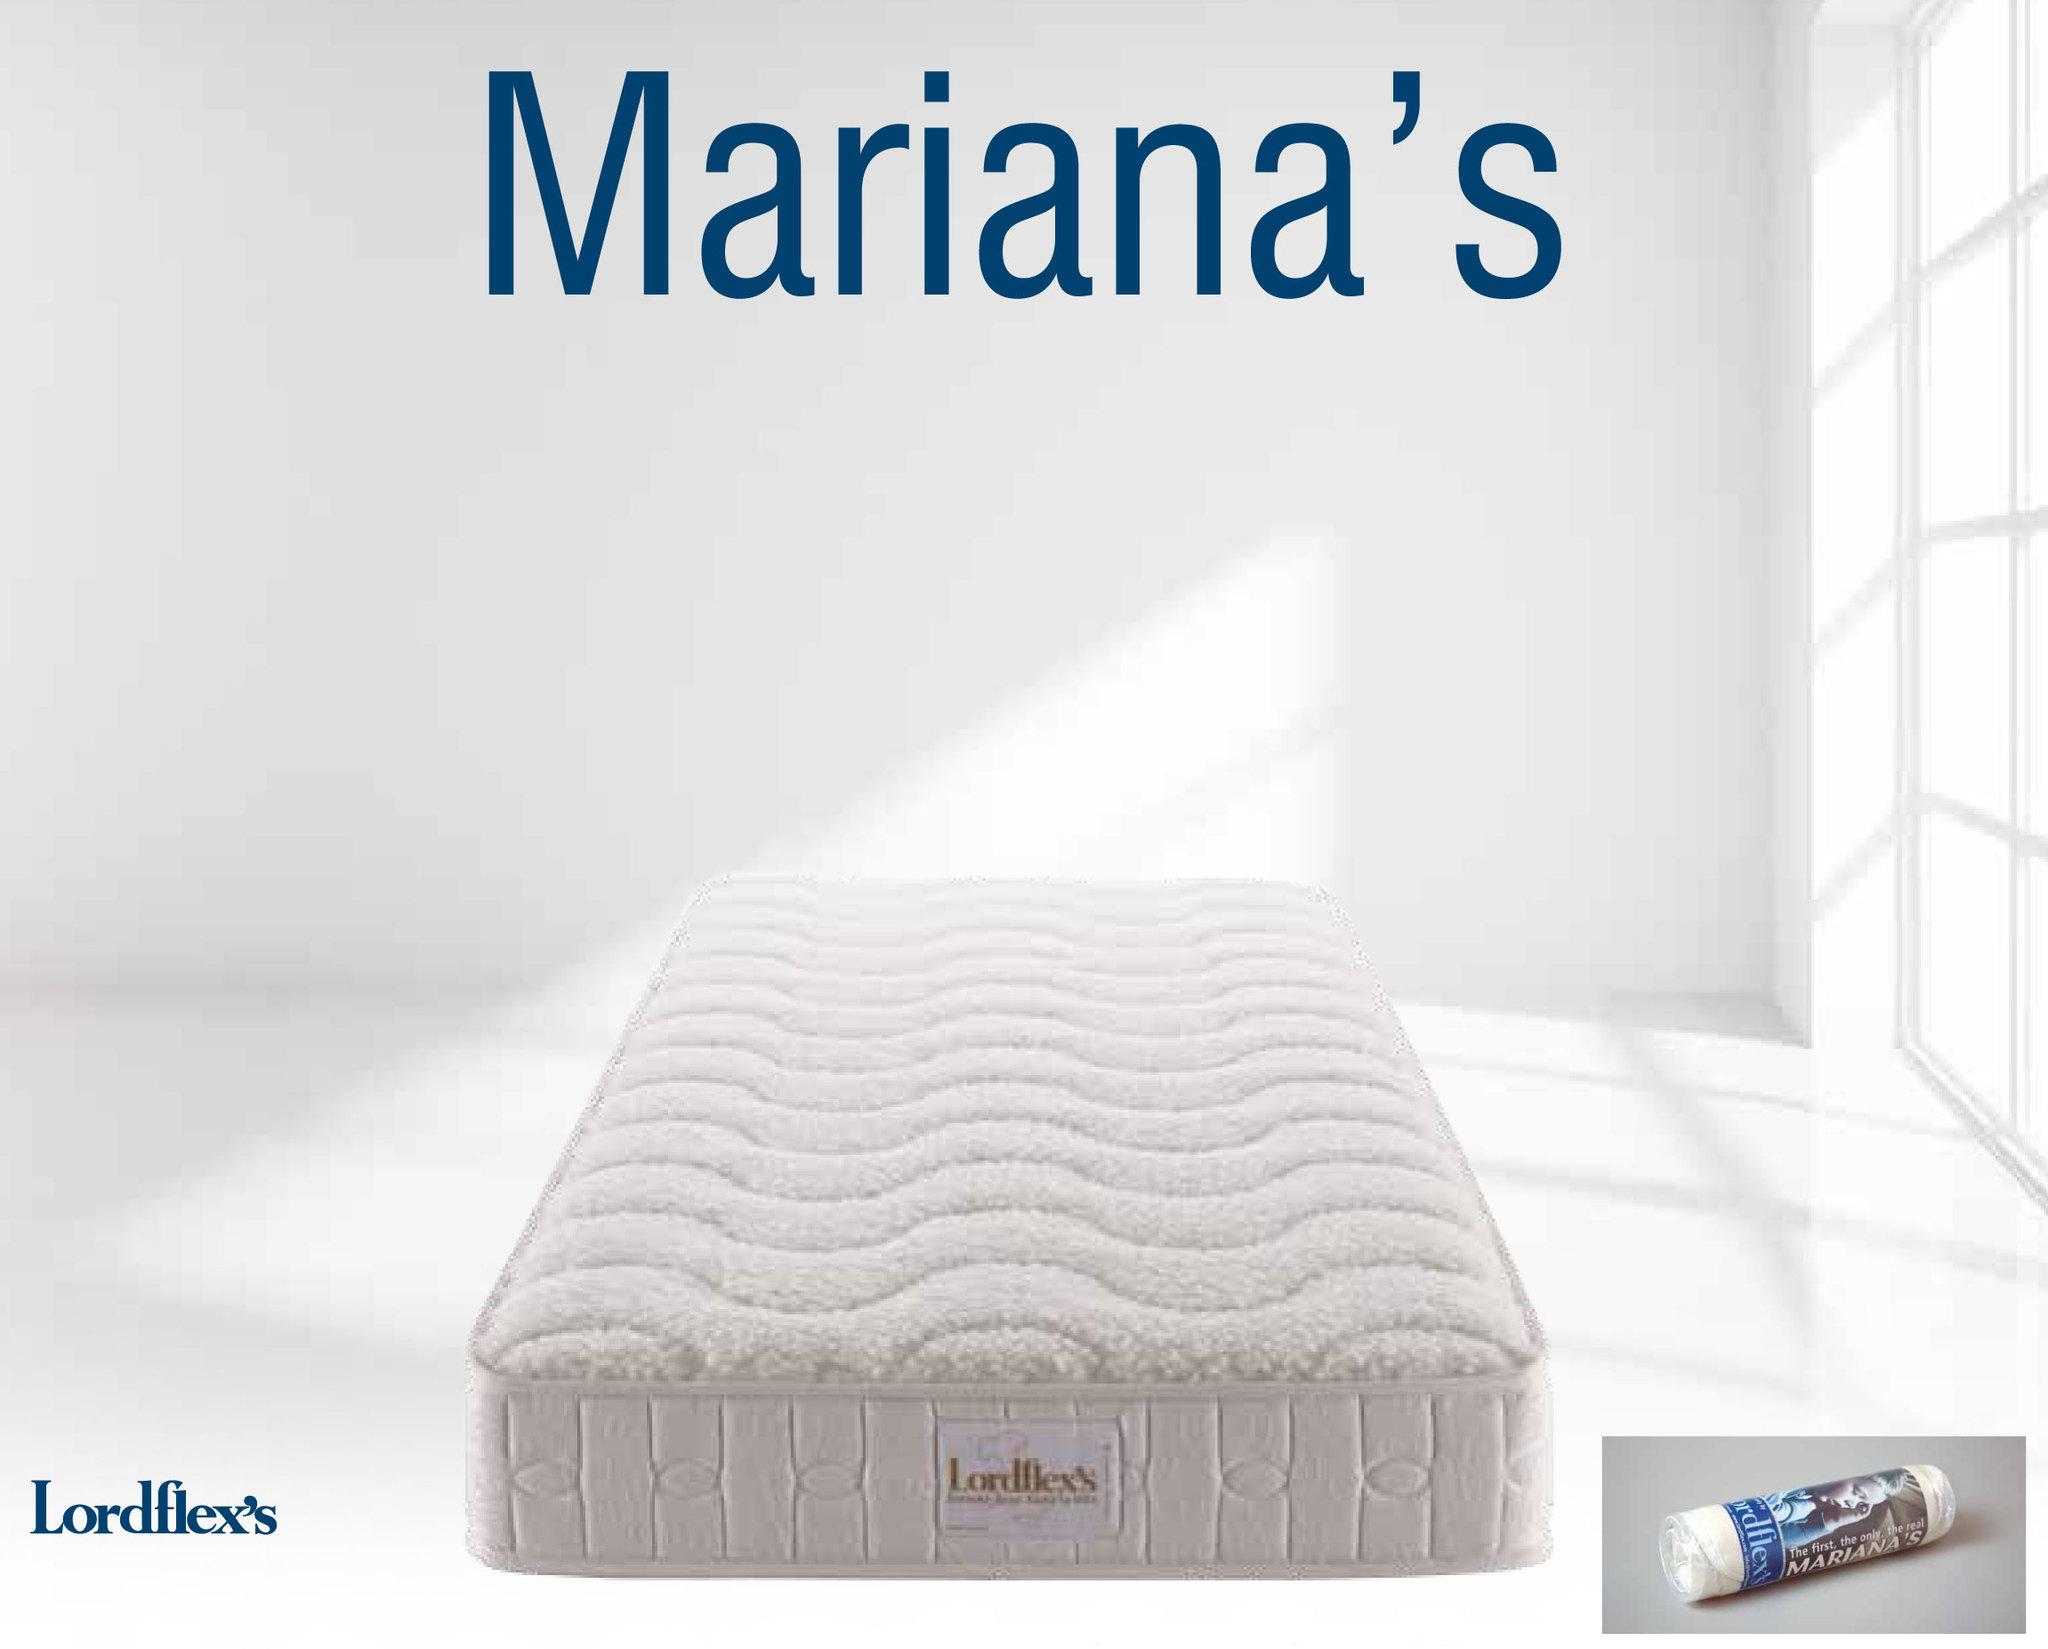 Матрасы Матрас ортопедический Lordflex's Mariana's 80х195 до 140 кг 1_Mariana_s.jpg